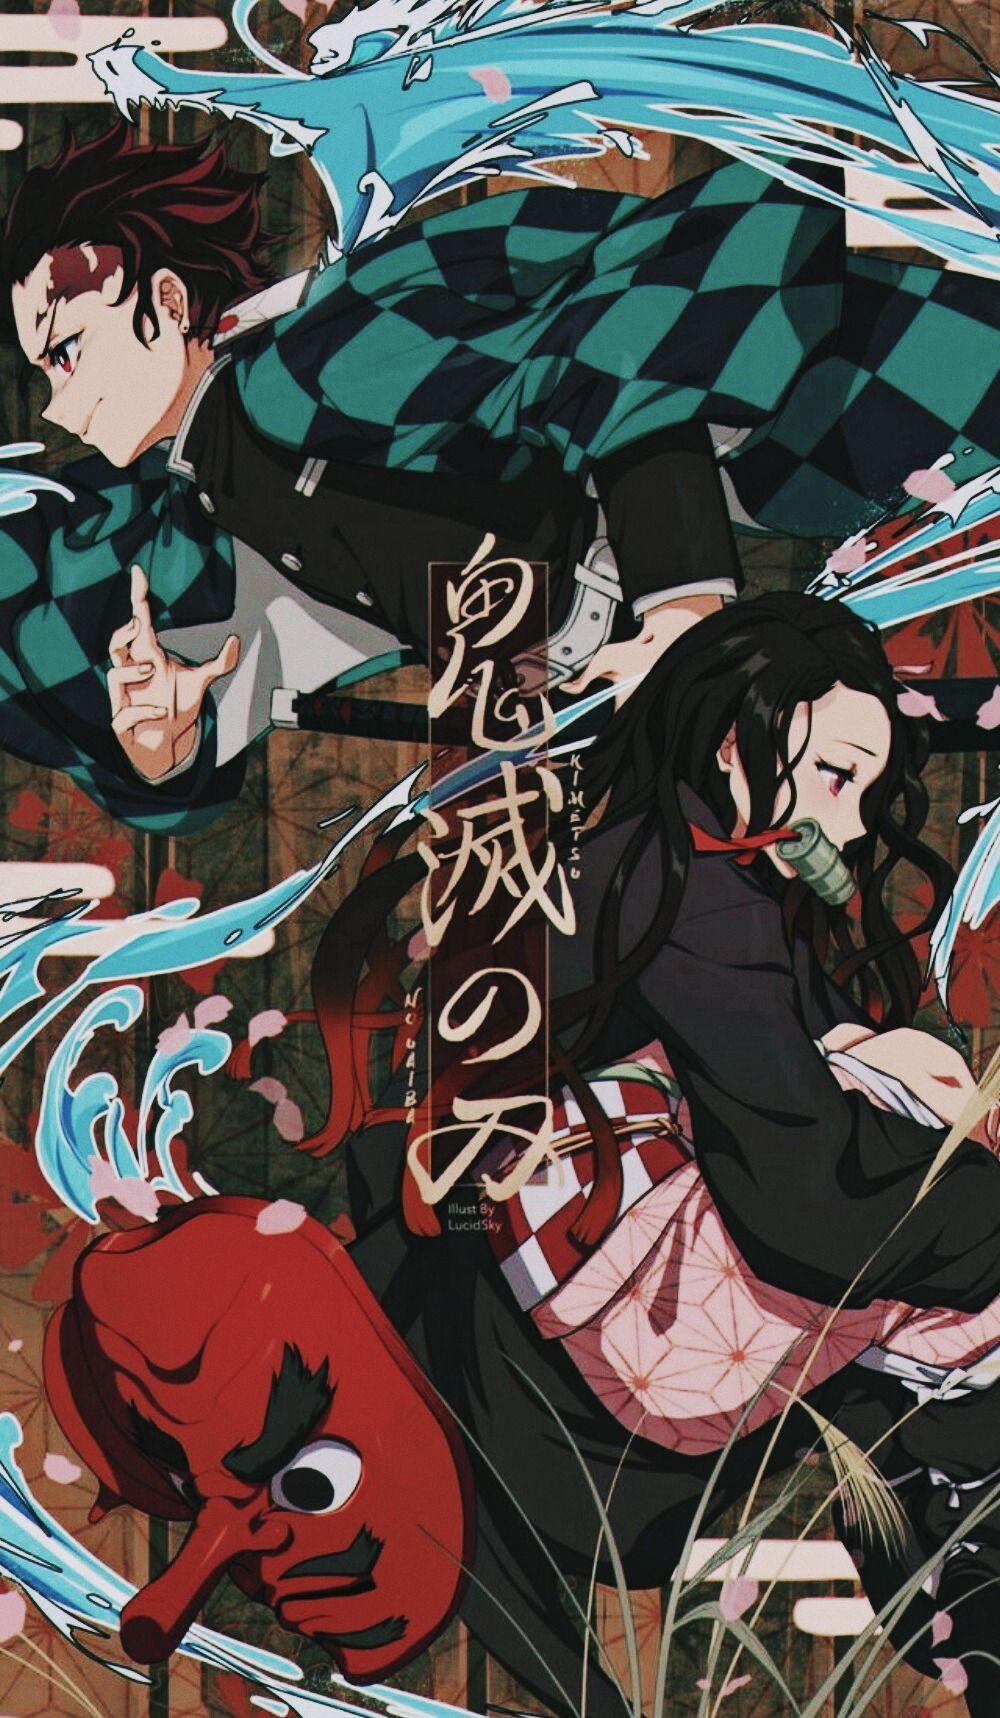 Kimetsu No Yaiba Wallpaper Android 3d Wallpapers Kimetsu No Yaiba Wallpaper Slayer Wallpaper Anime Demon